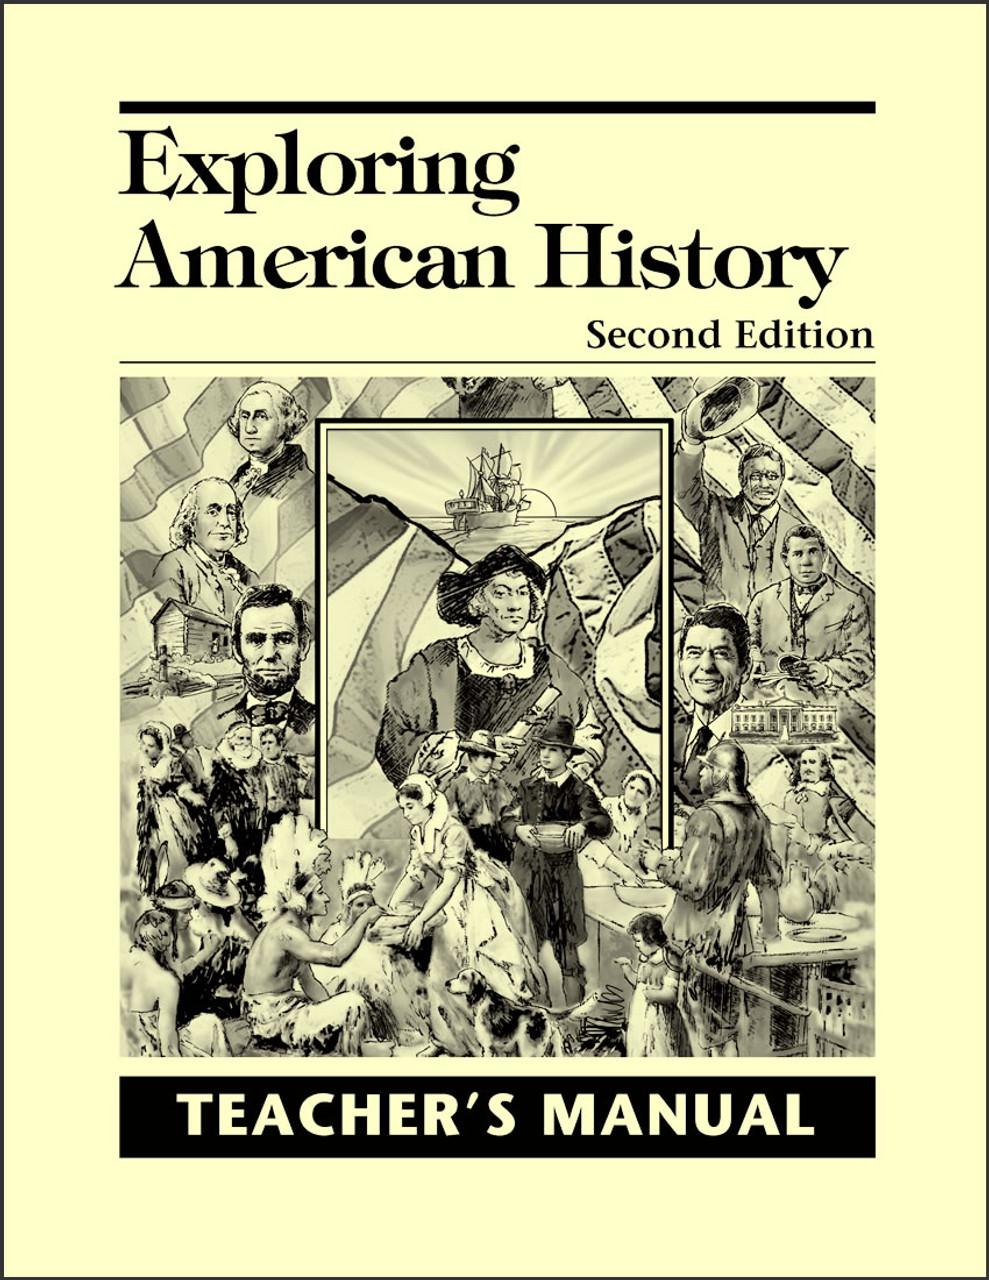 Exploring American History, 2nd edition - Teacher's Manual